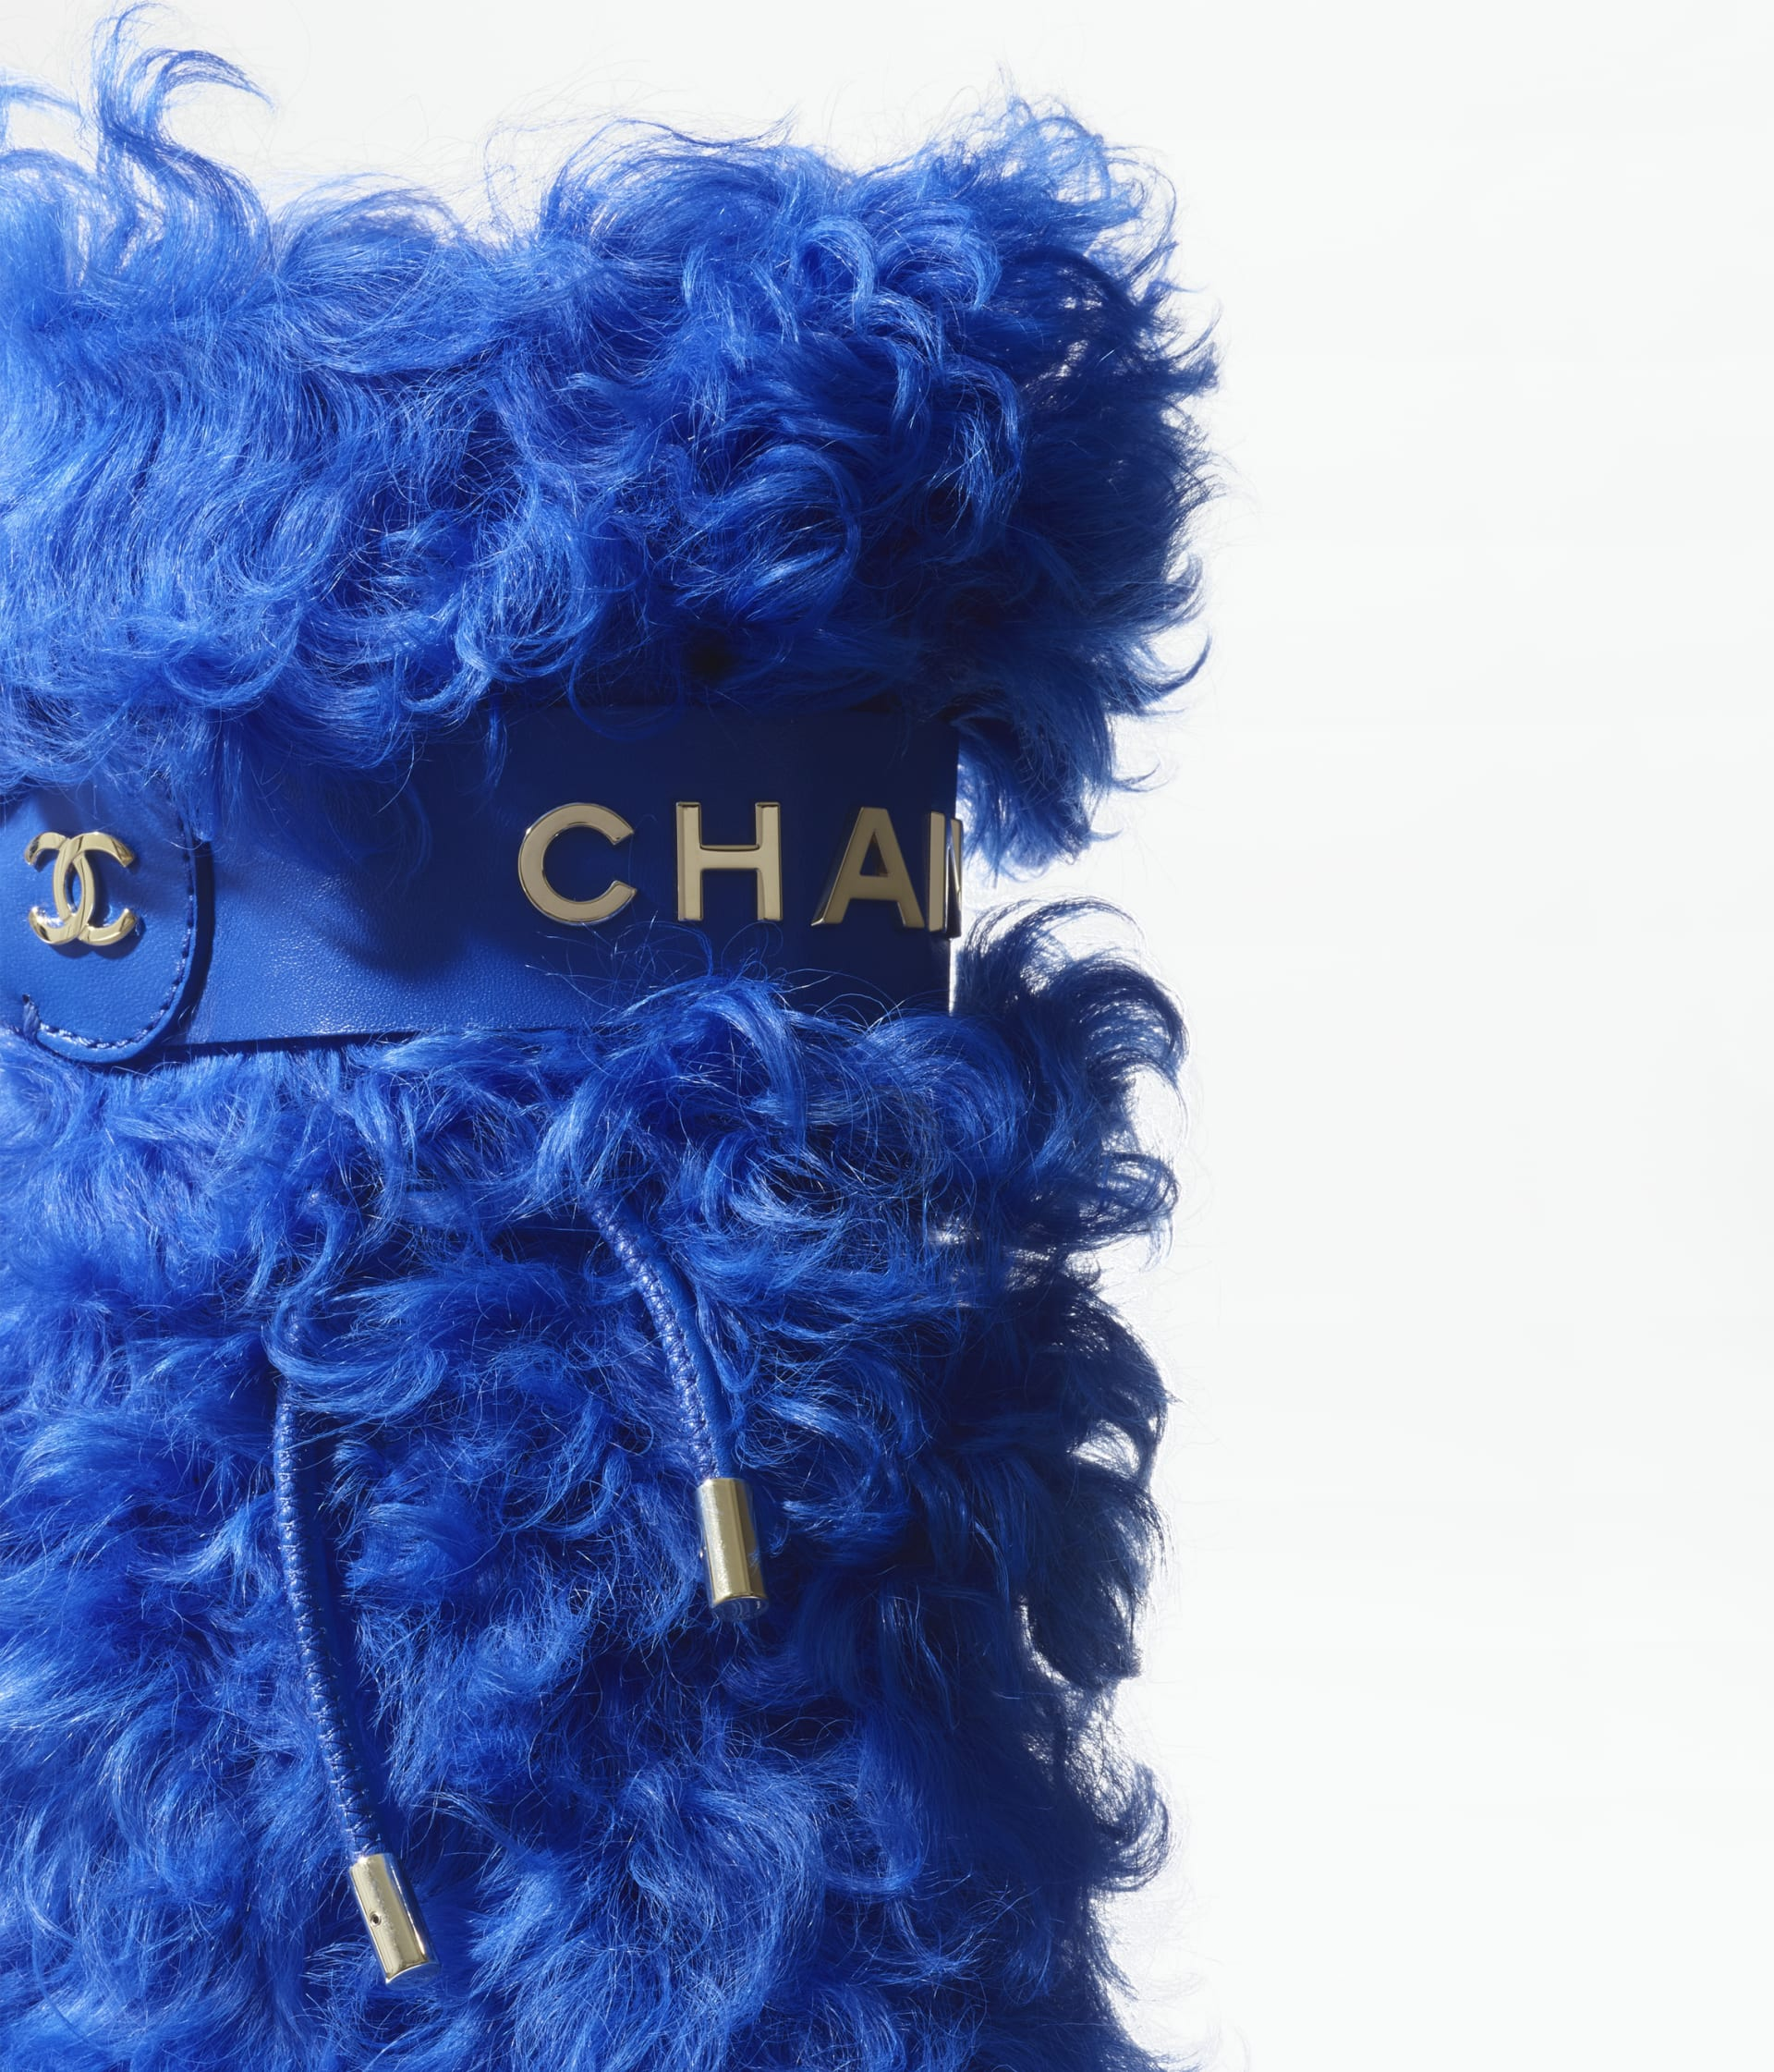 image 3 - High Boots - Shearling Sheepskin - Blue & Black